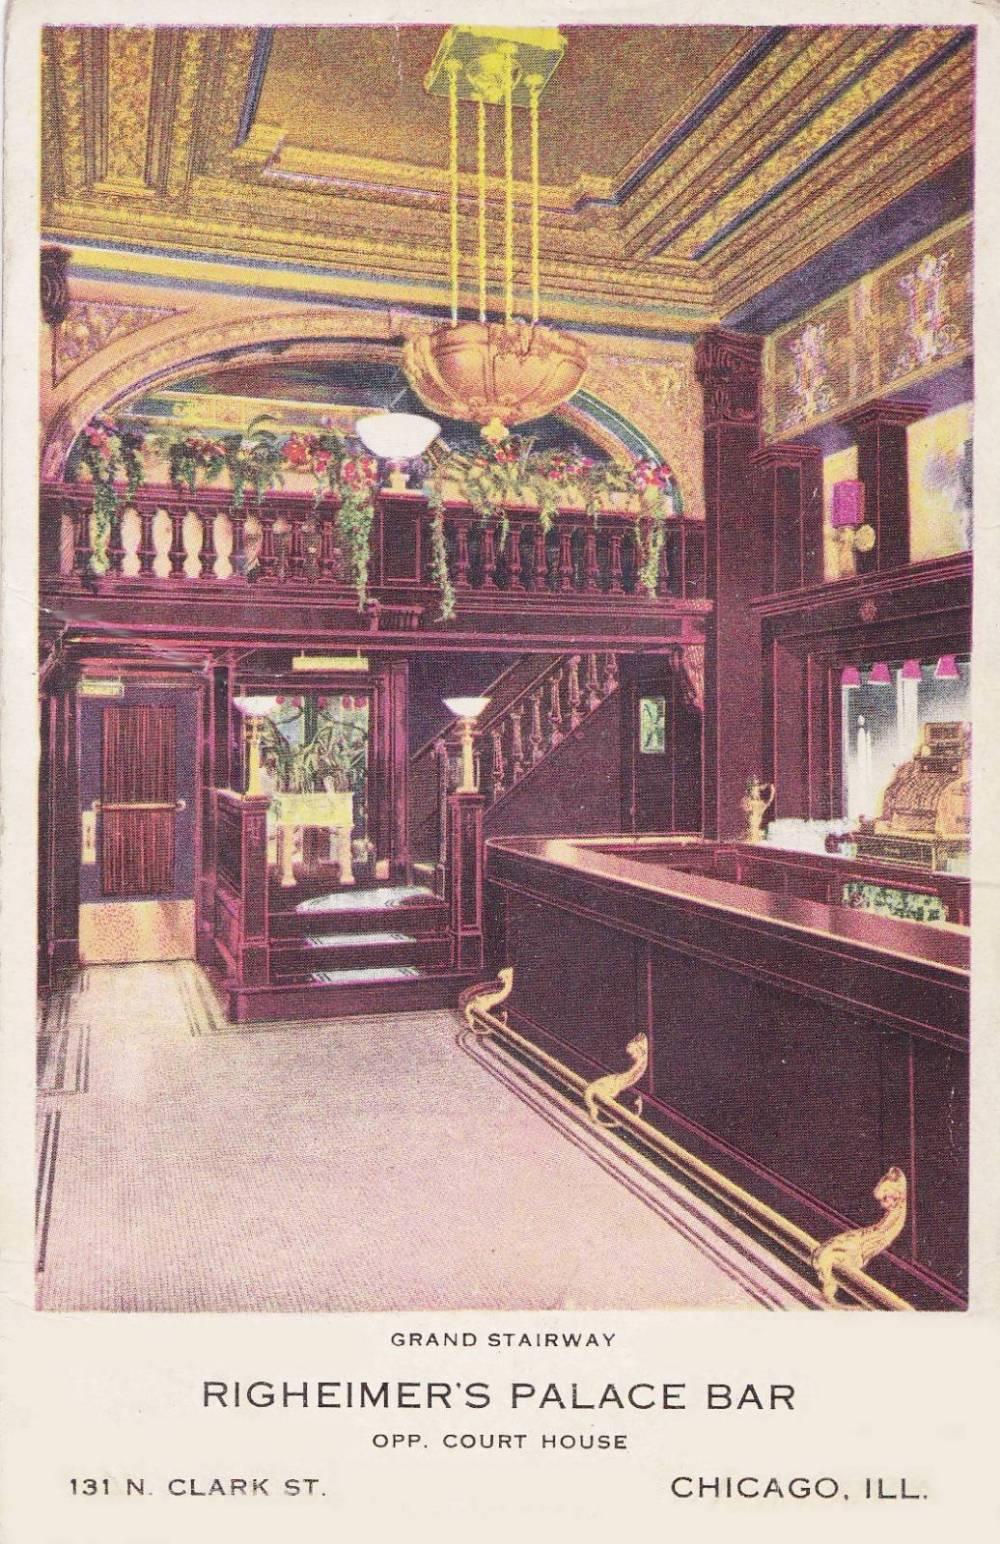 POSTCARD - CHICAGO - RIGHEIMER'S PALACE BAR - 131 N CLARK - OPPOSITE COURT HOUSE - GRAND STAIRWAY - c1910